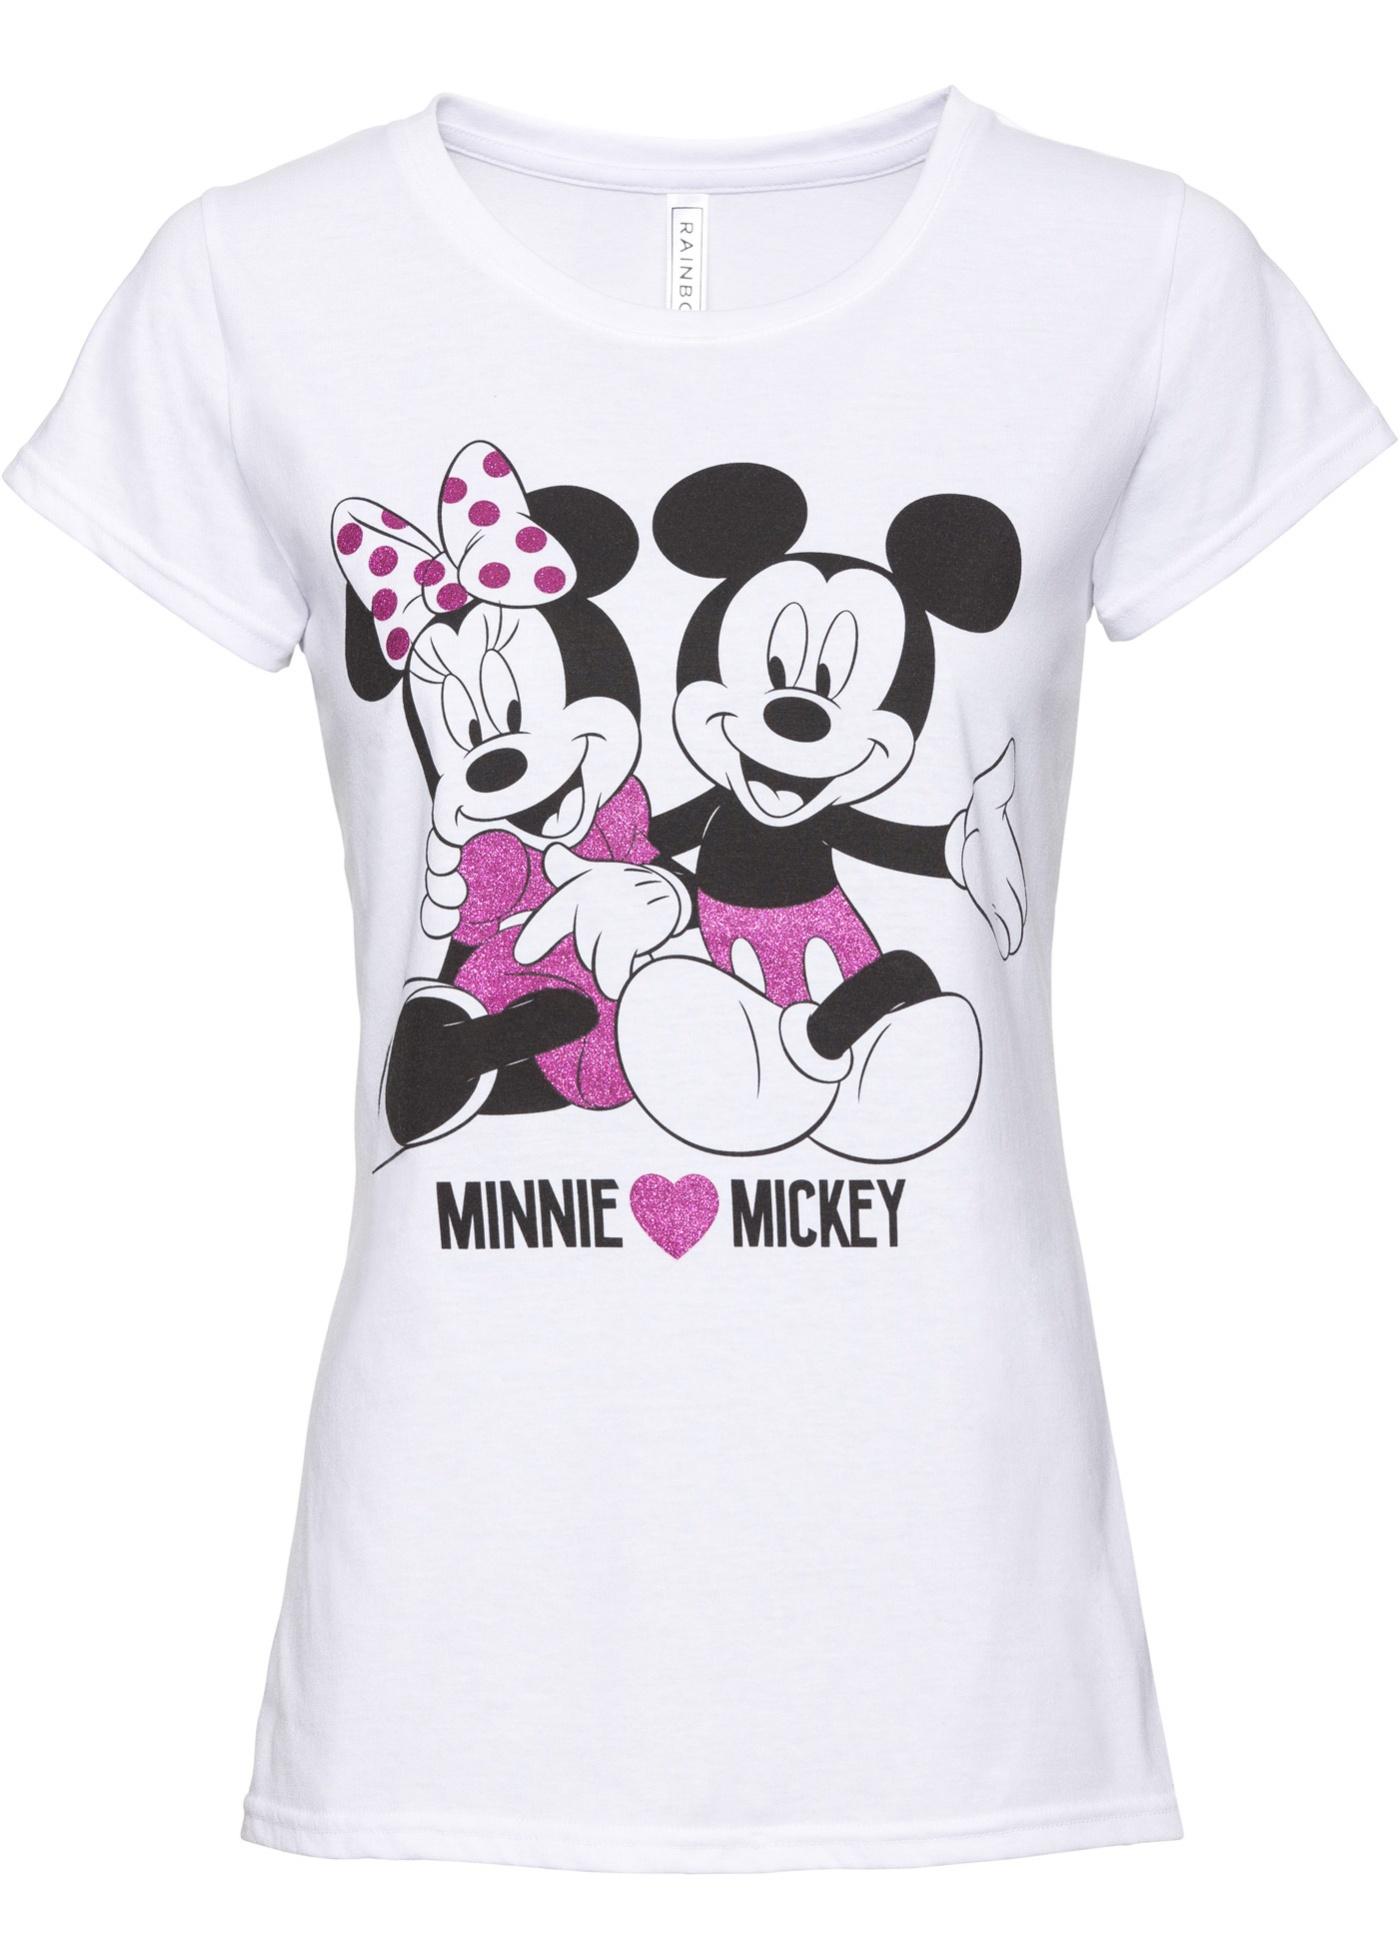 680c855aba9d Tričko Mickey Mouse - Bílá